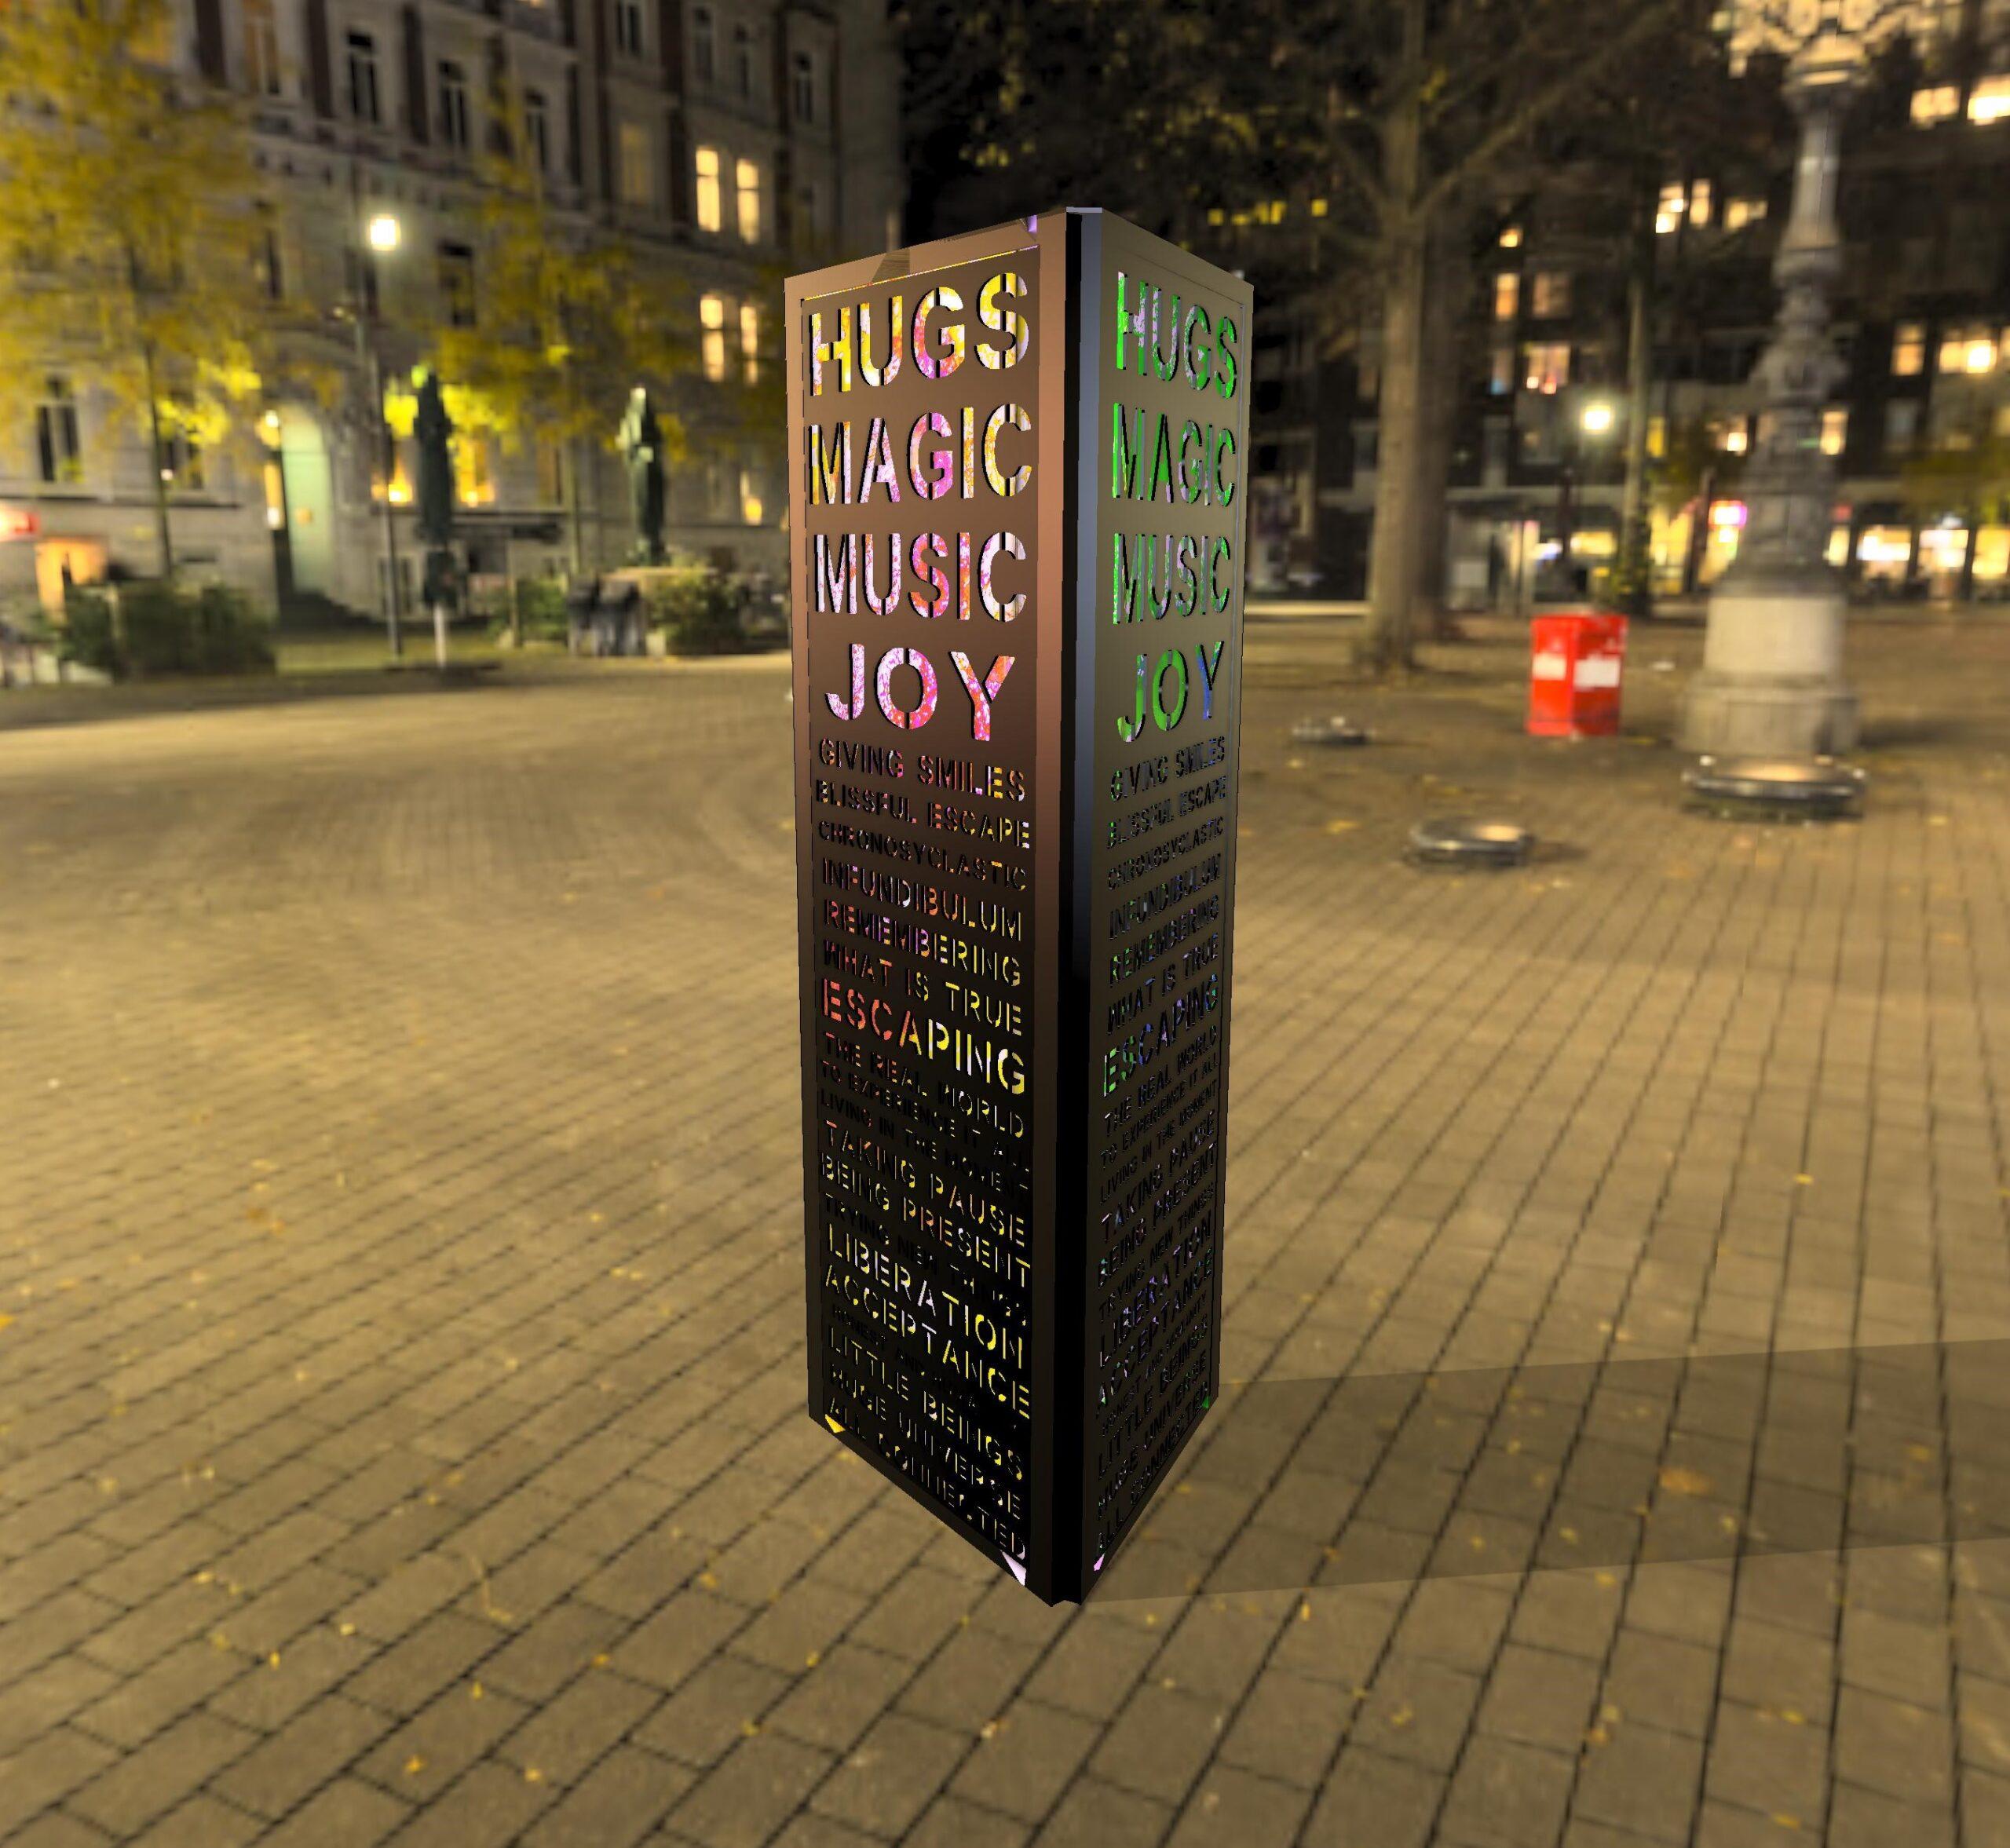 http://orloskystudio.com/wp-content/uploads/2021/10/POP-Light-Box-Prism-Pillar-3-scaled.jpg